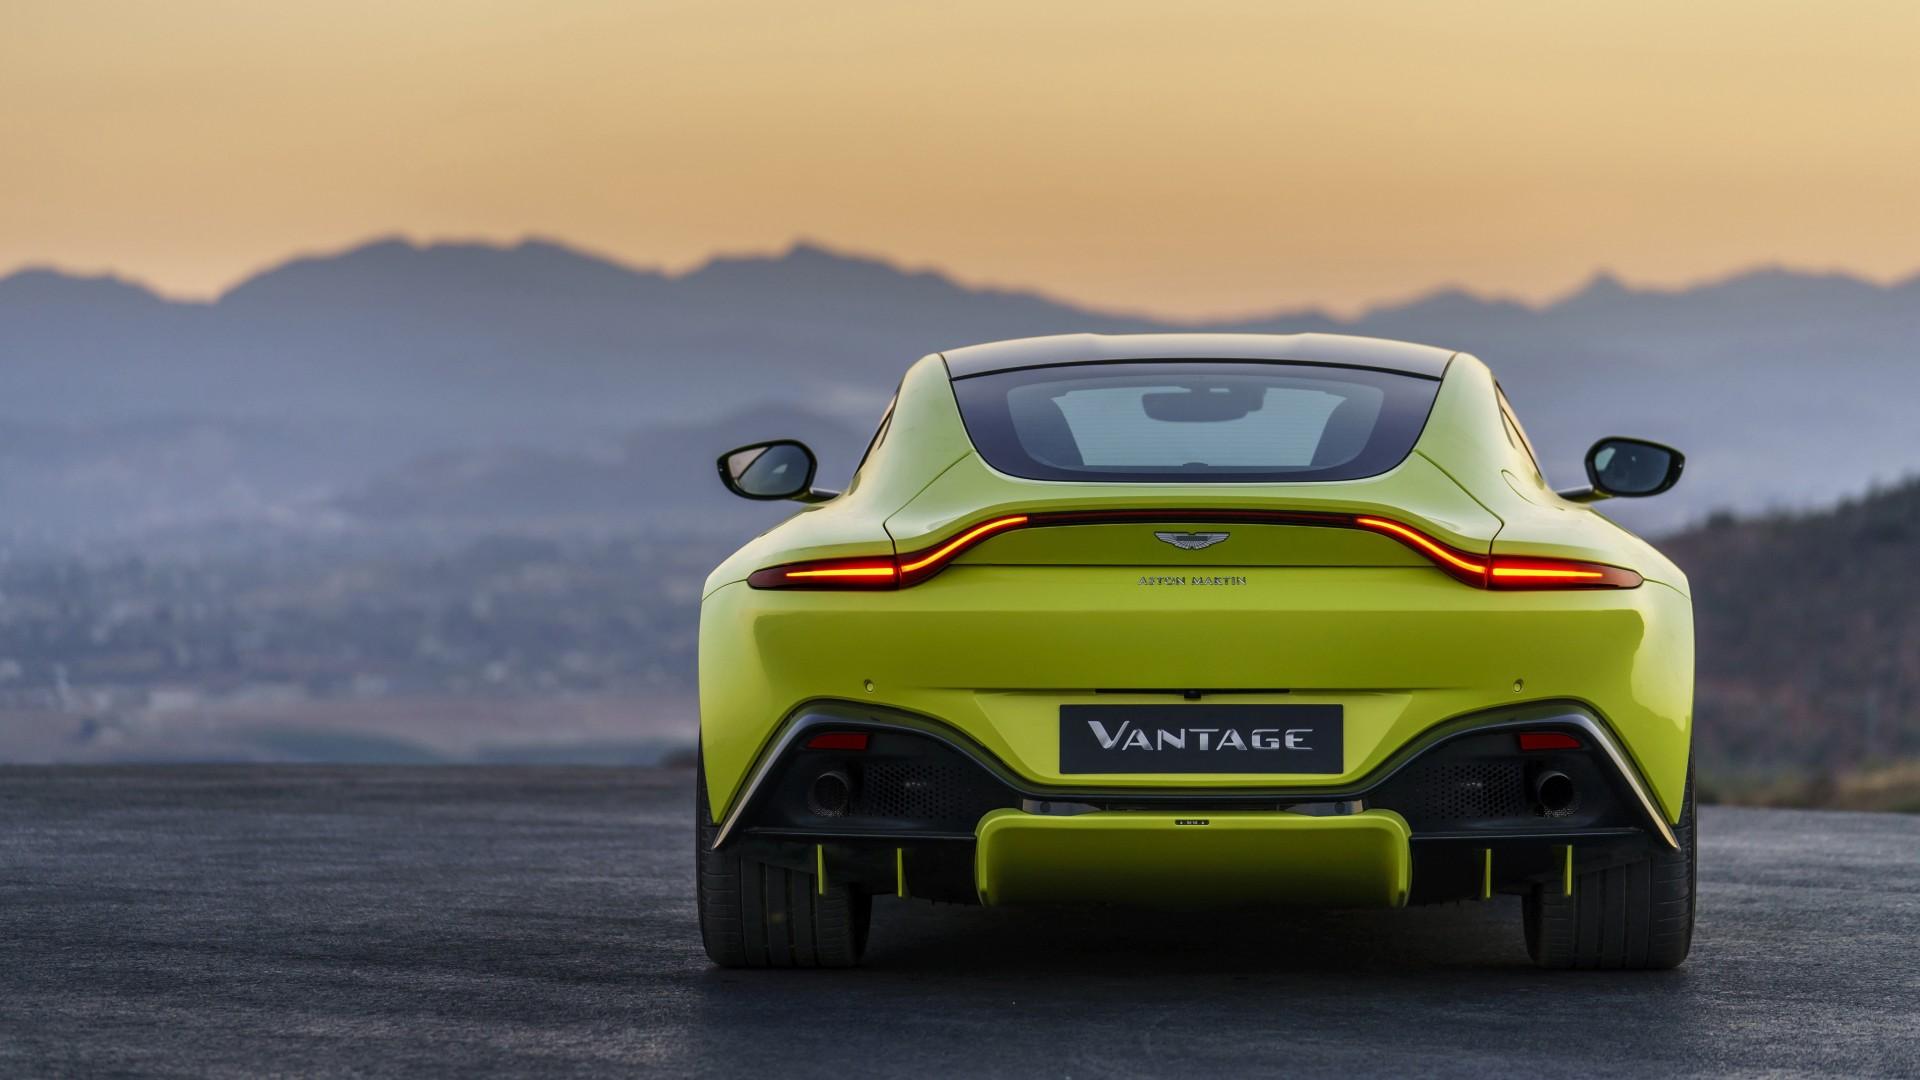 2018 Aston Martin Vantage 4K 6 Wallpaper | HD Car ...